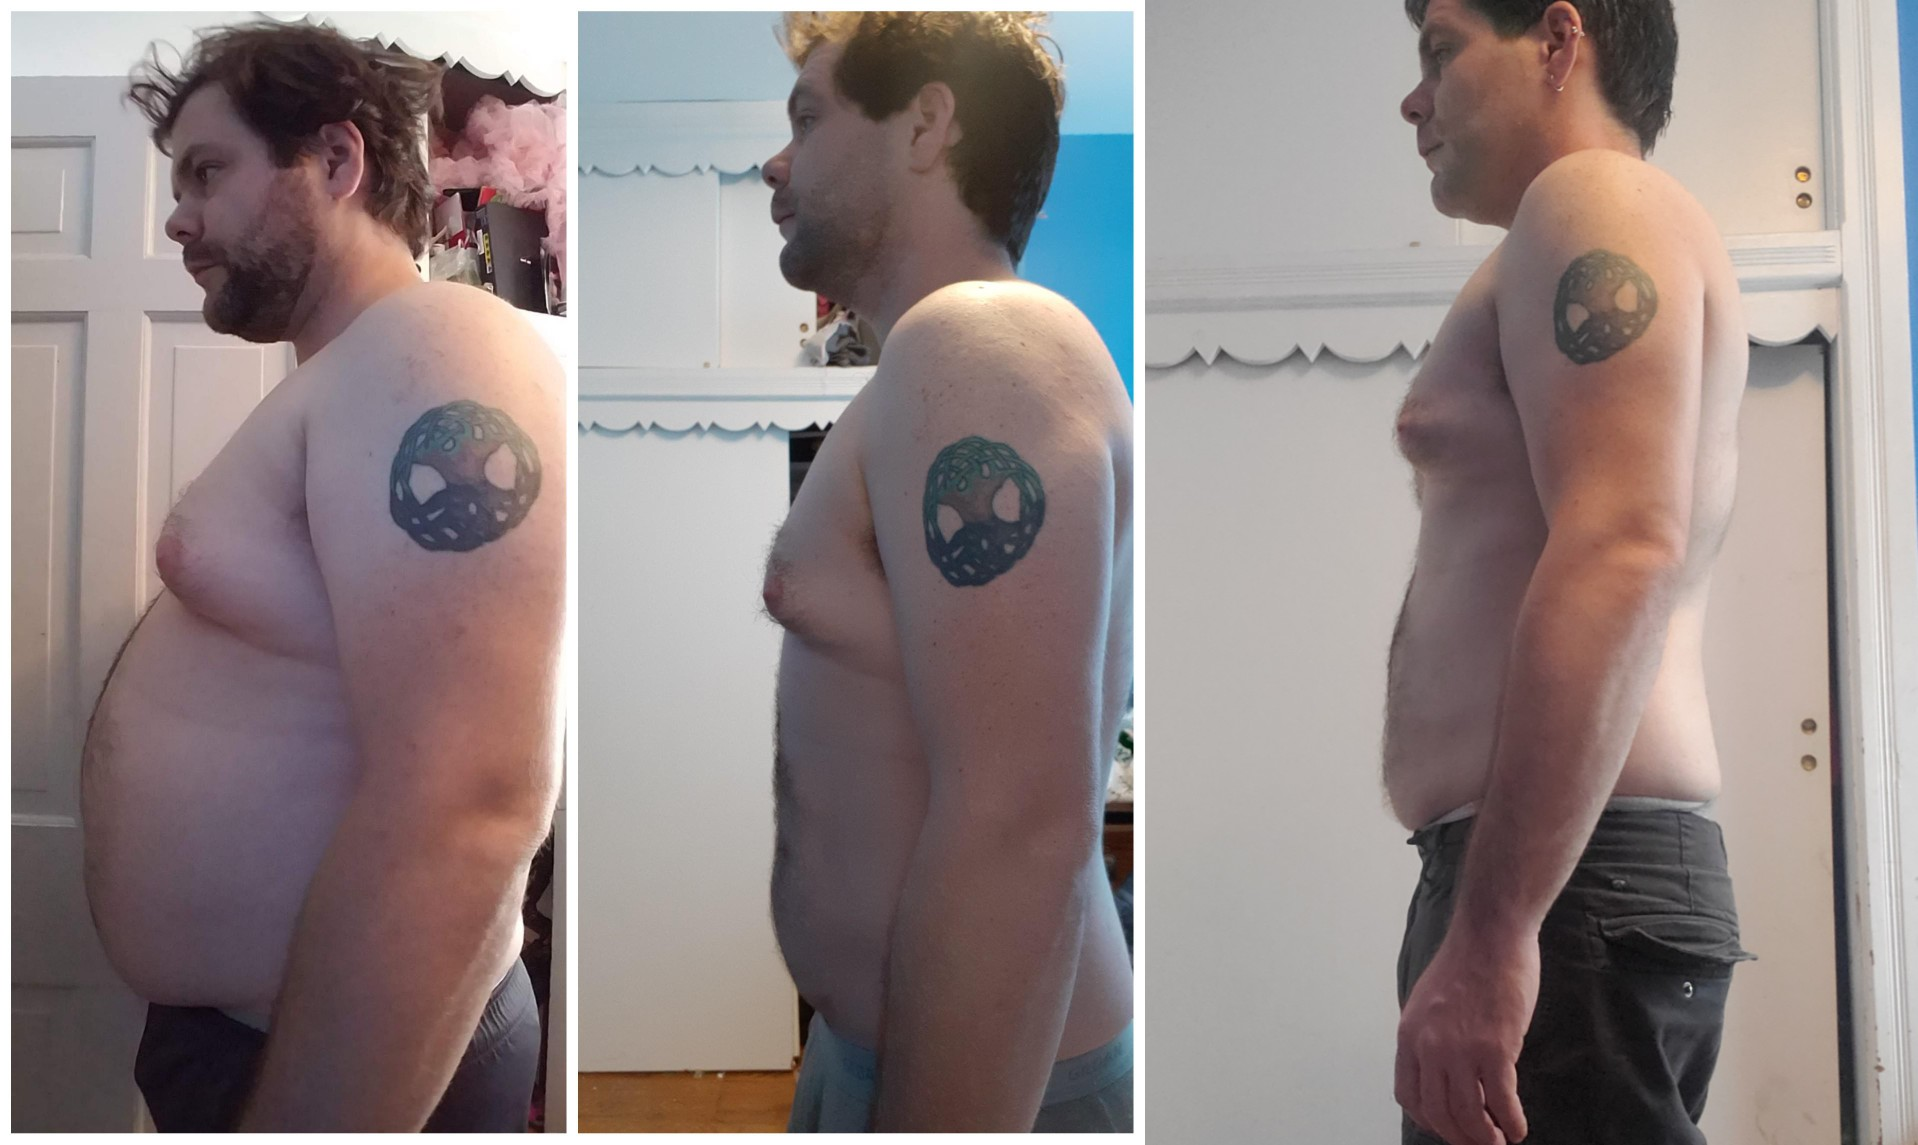 5'11 Male Progress Pics of 65 lbs Weight Loss 253 lbs to 188 lbs